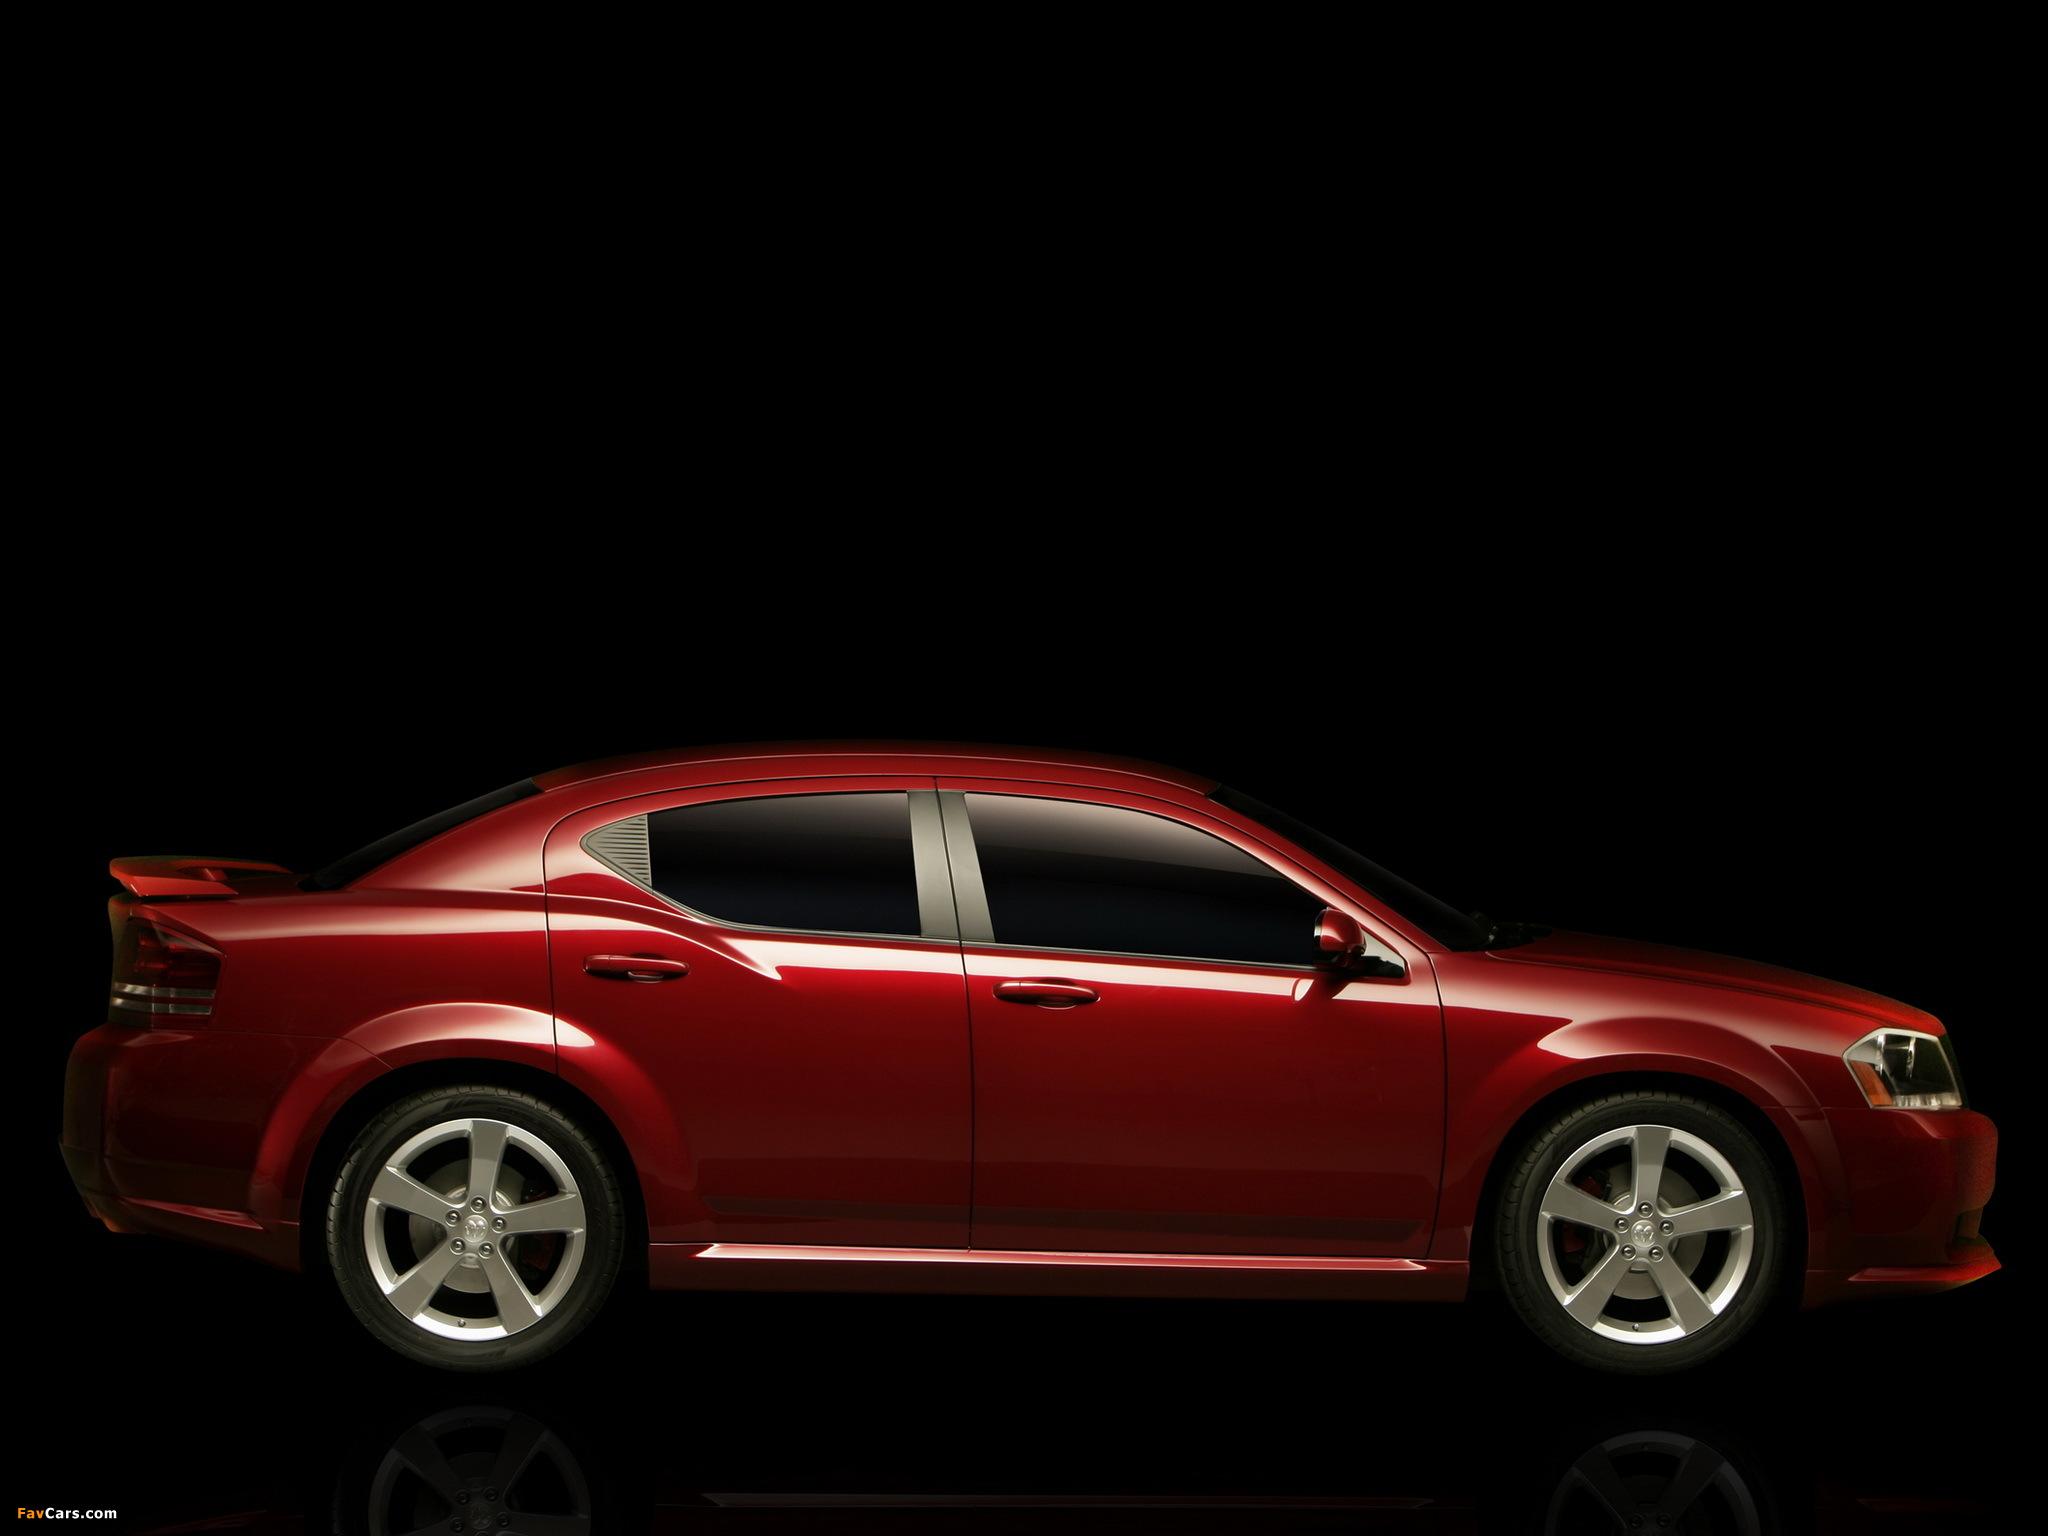 Dodge Avenger Concept 2006 wallpapers (2048 x 1536)